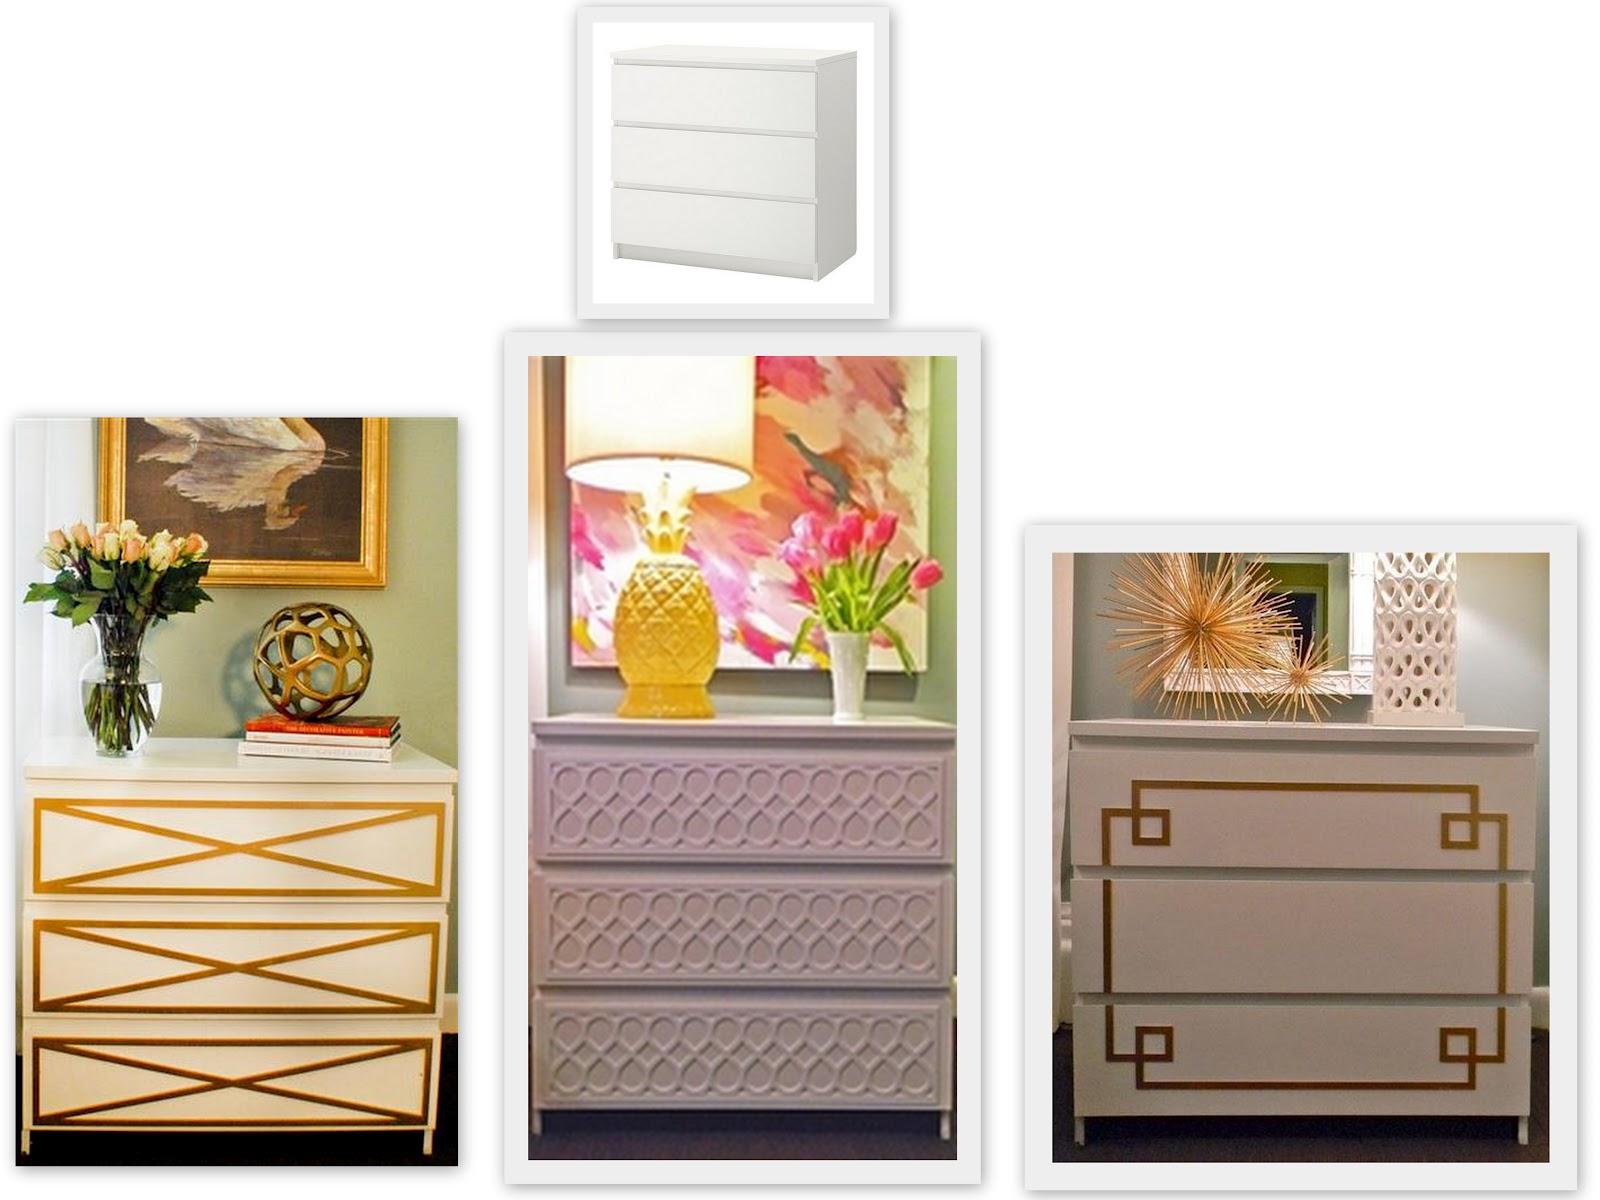 Ikea Frisiertisch Aufbewahrung ~ Here are two transformations of the Ikea Rast Dresser using O'verlays